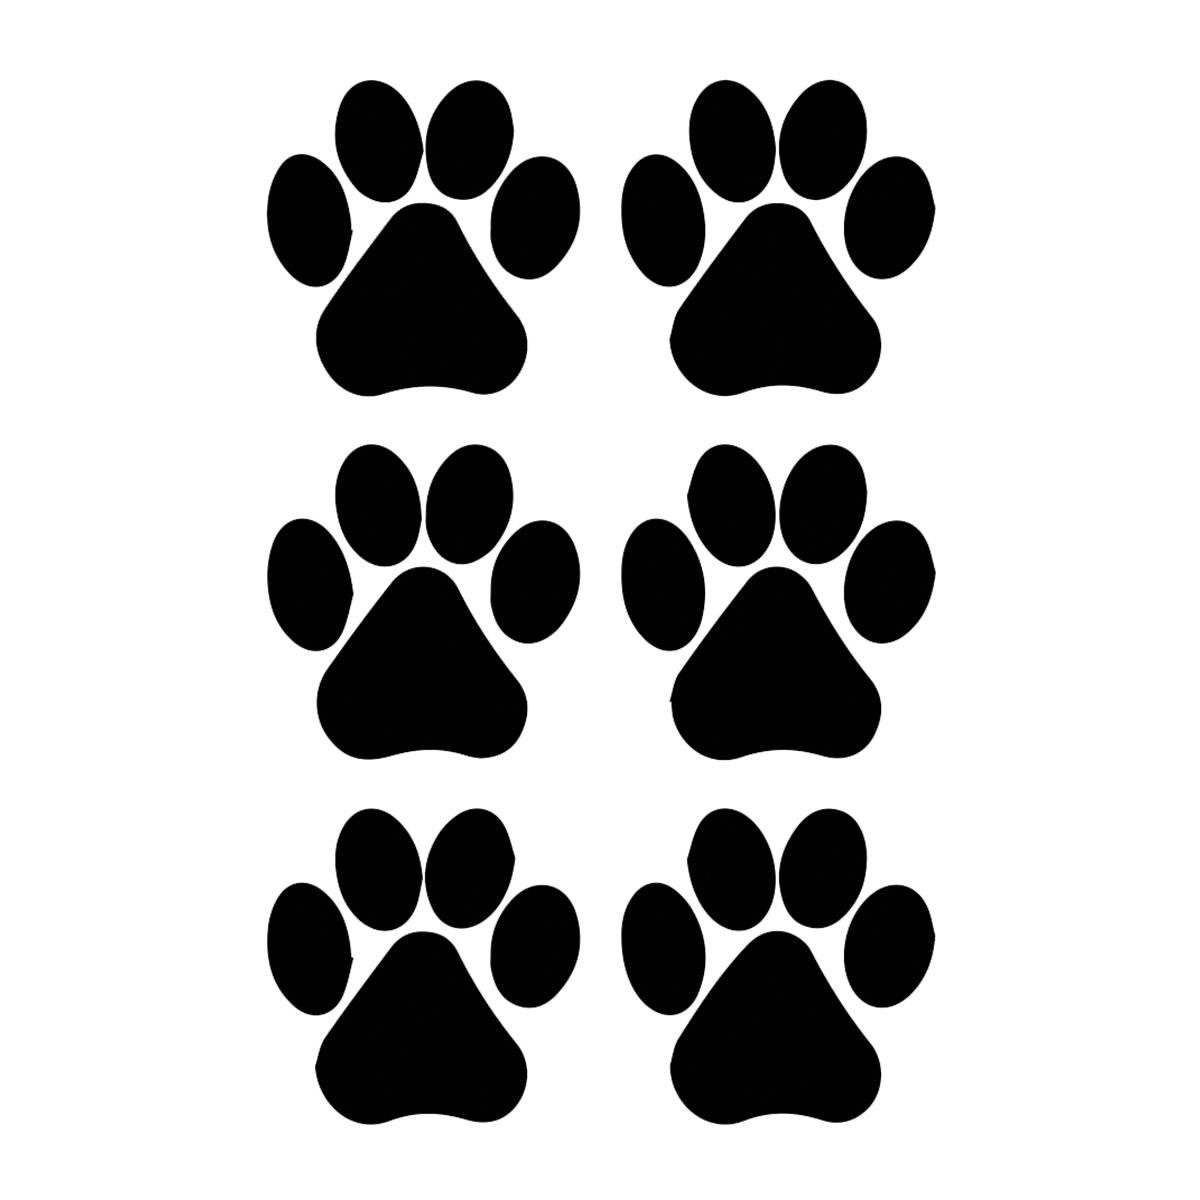 1200x1200 Dog Paw Prints Silhouette Vinyl Decal